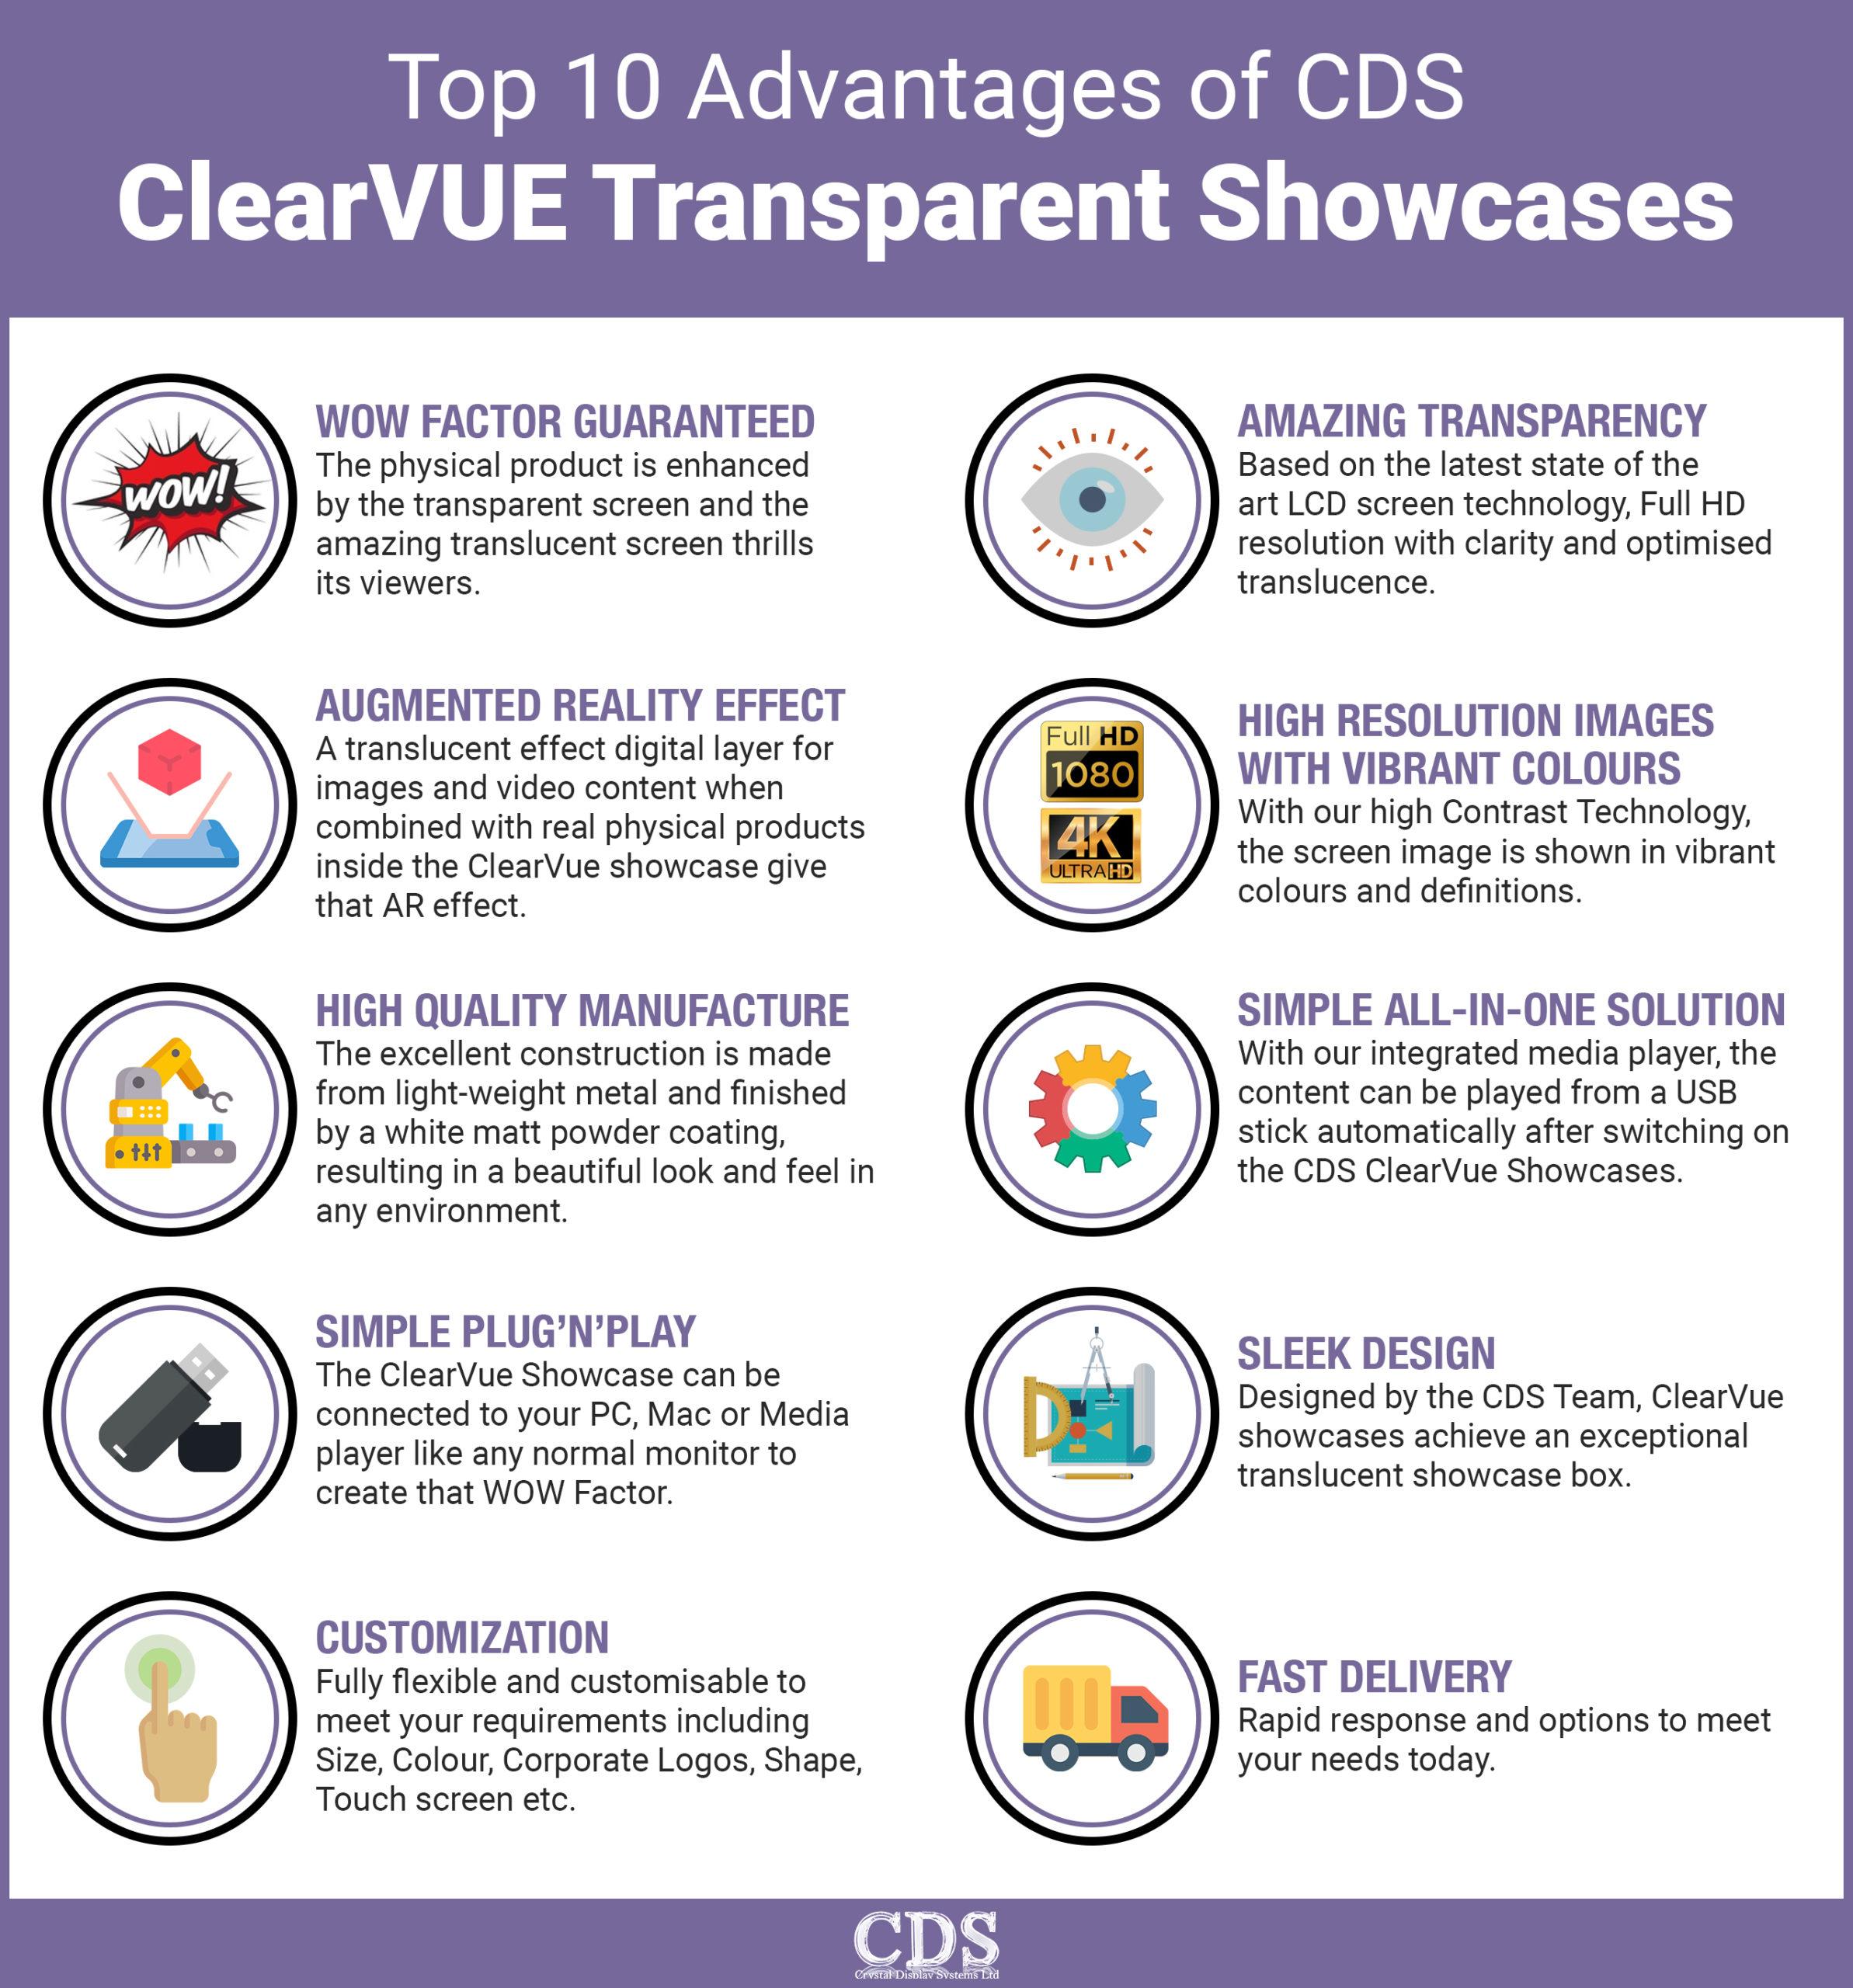 Top 10 advantages of CDS ClearVUE showcases